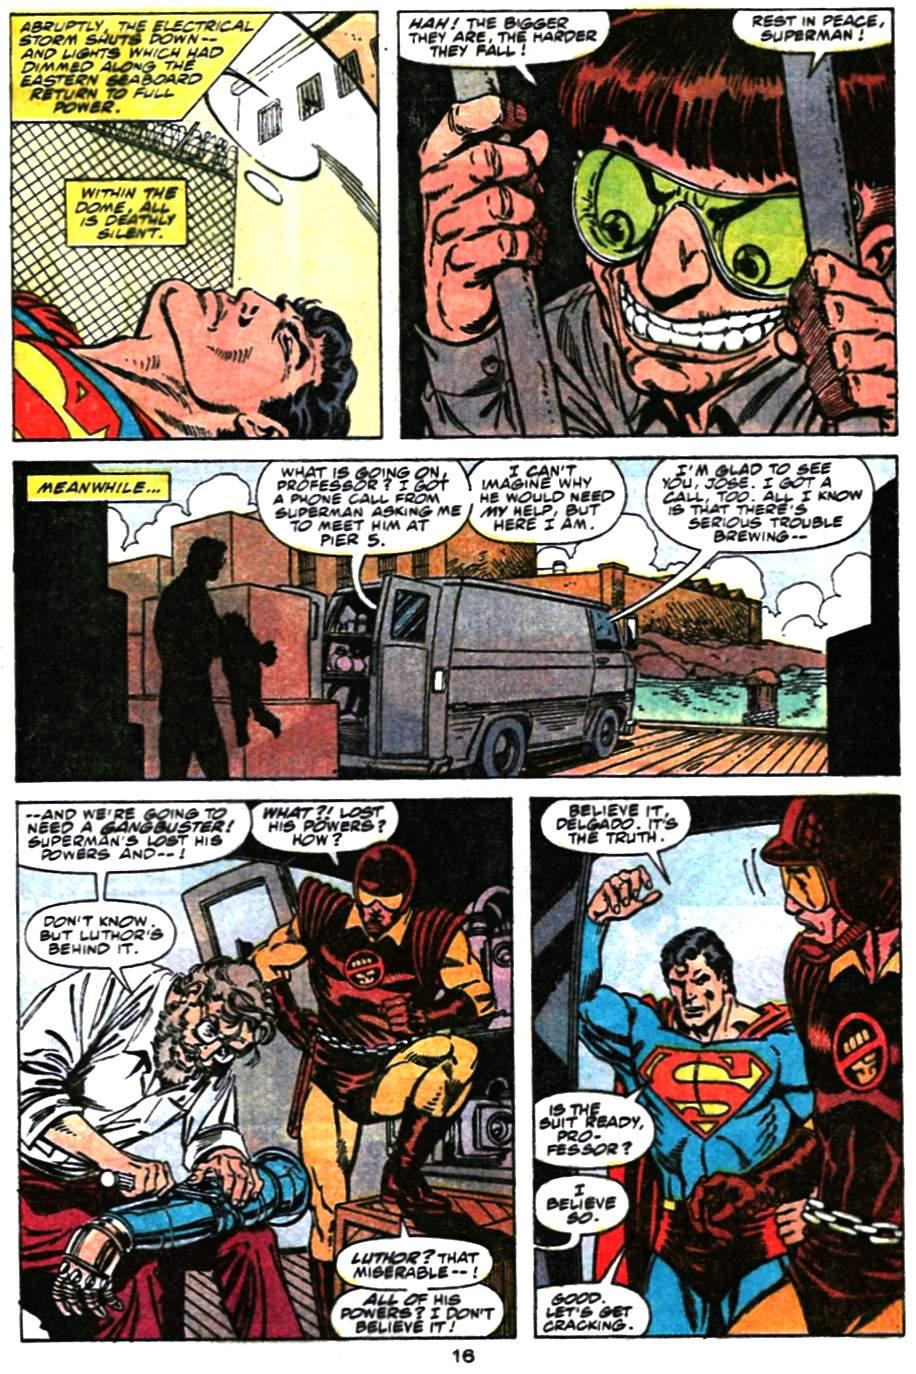 Action Comics (1938) 659 Page 16